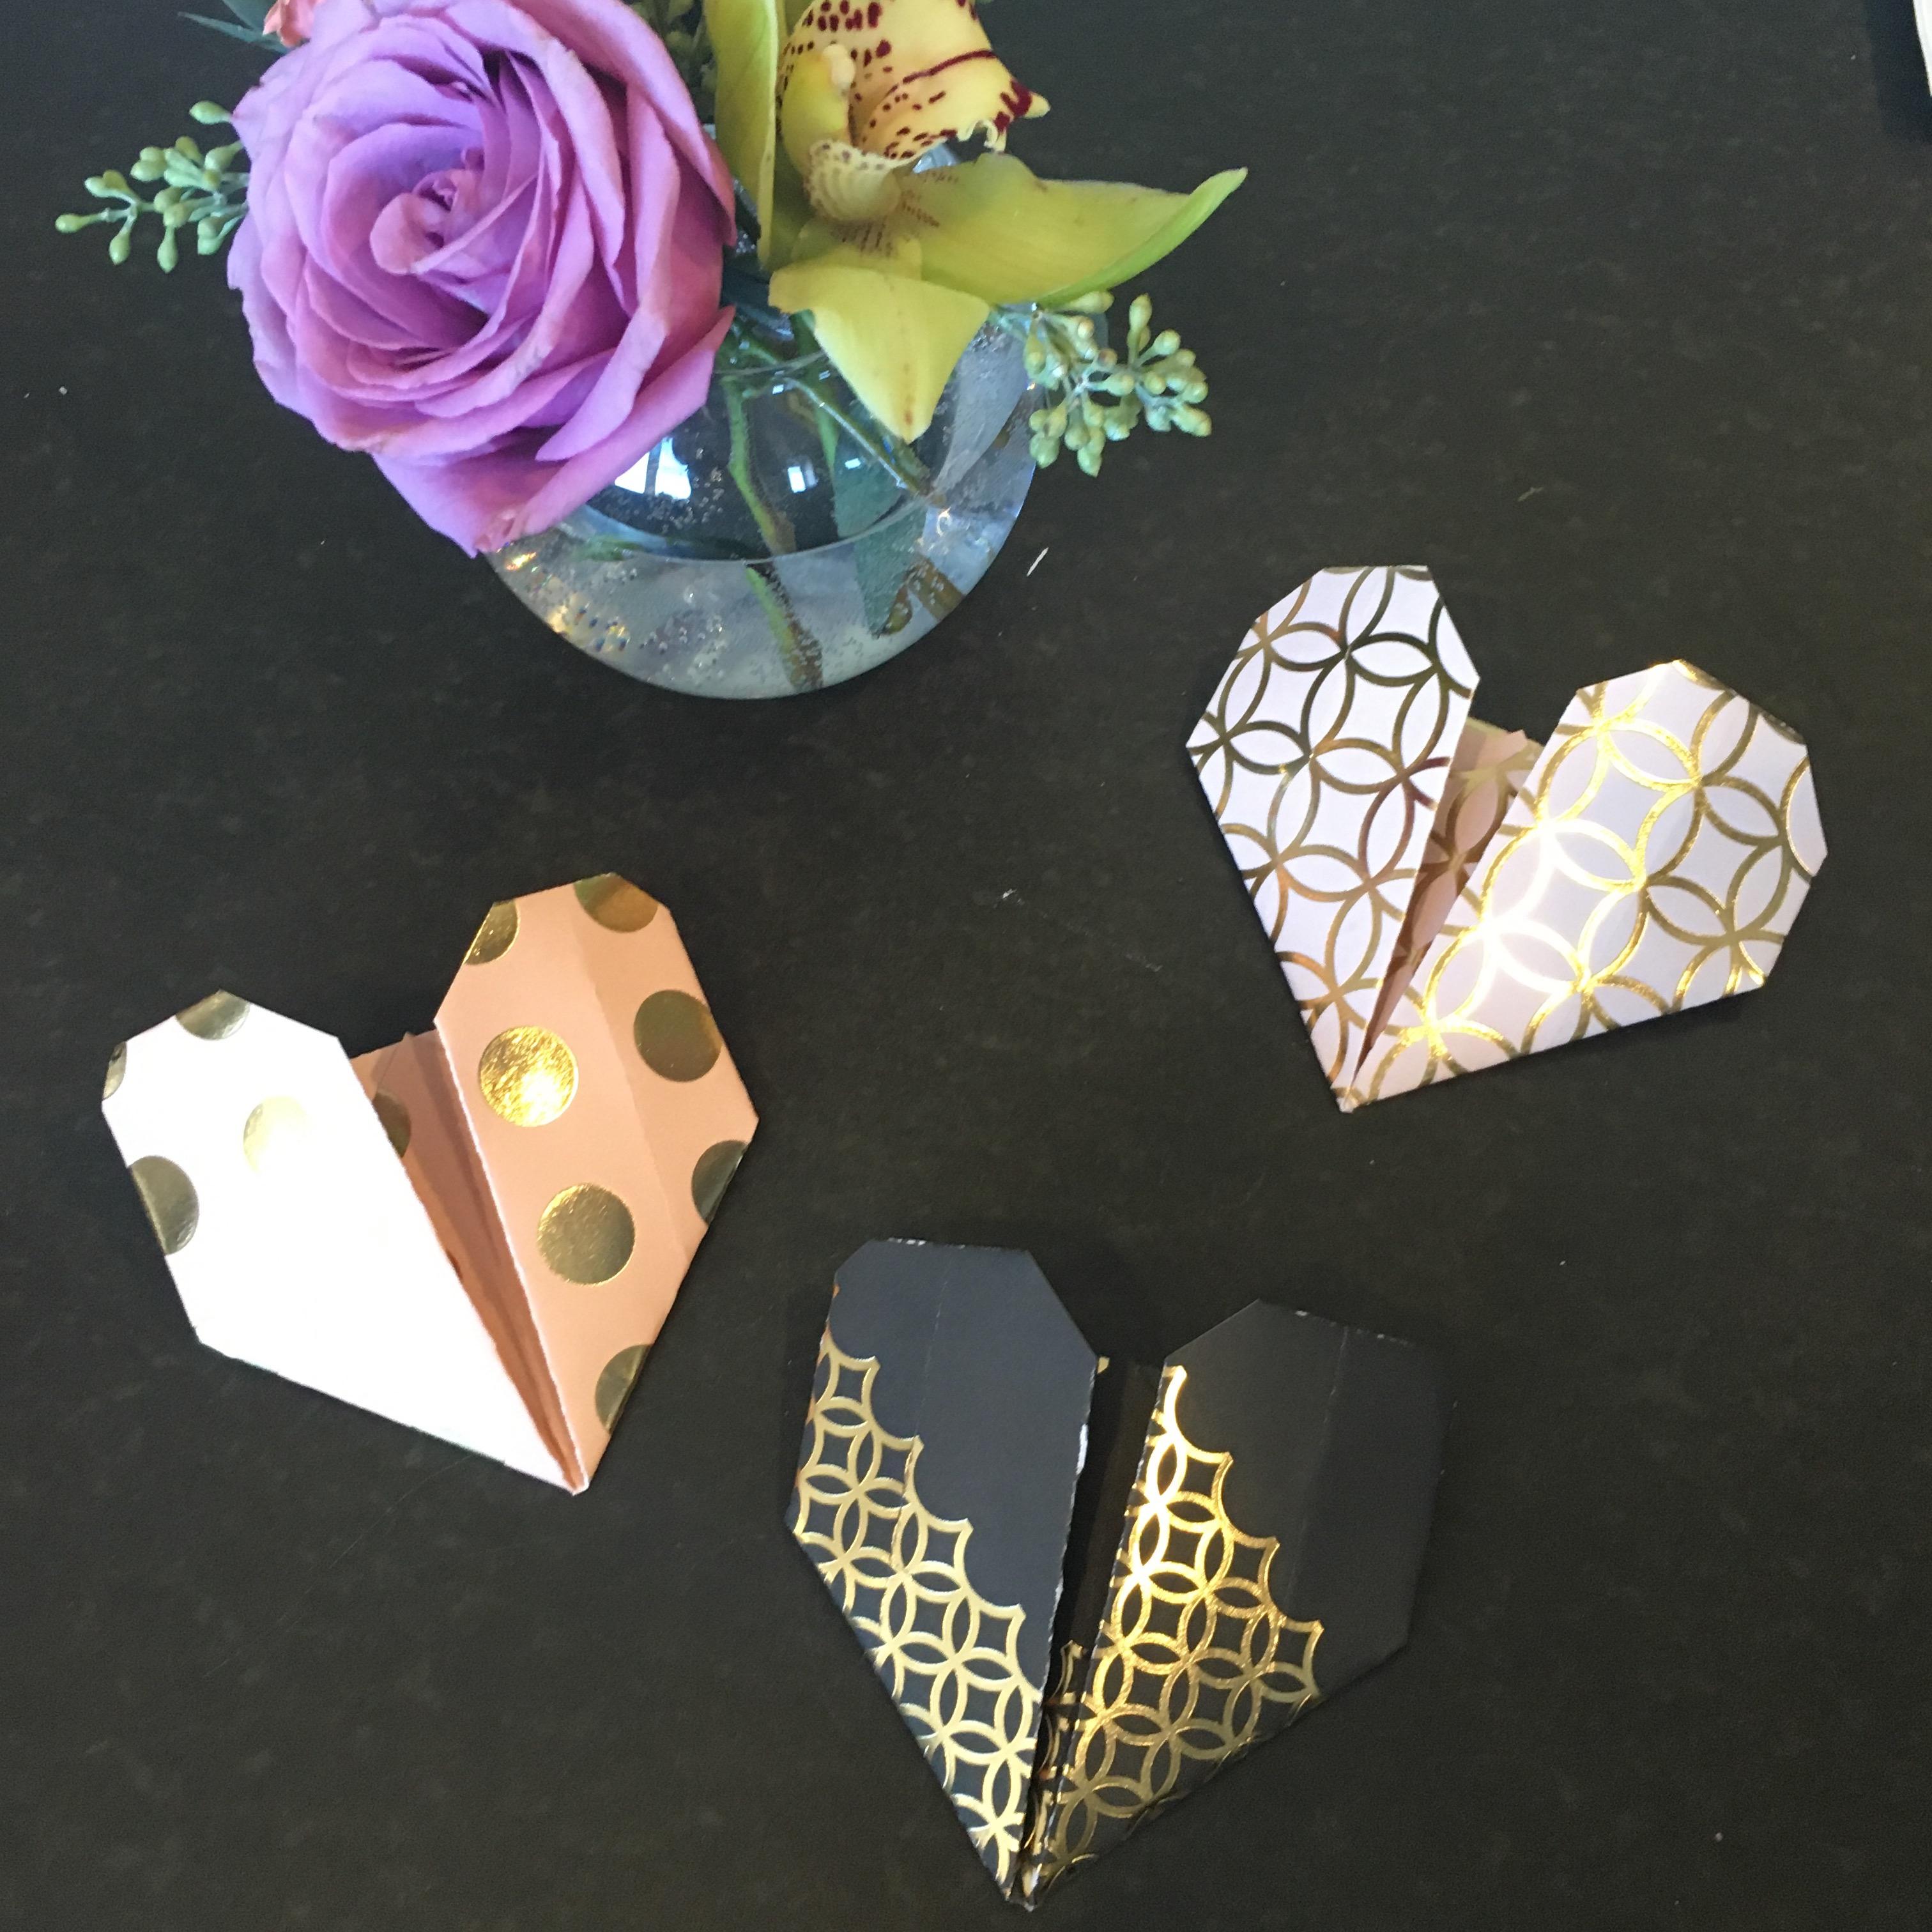 duluth_network_conversation_hearts